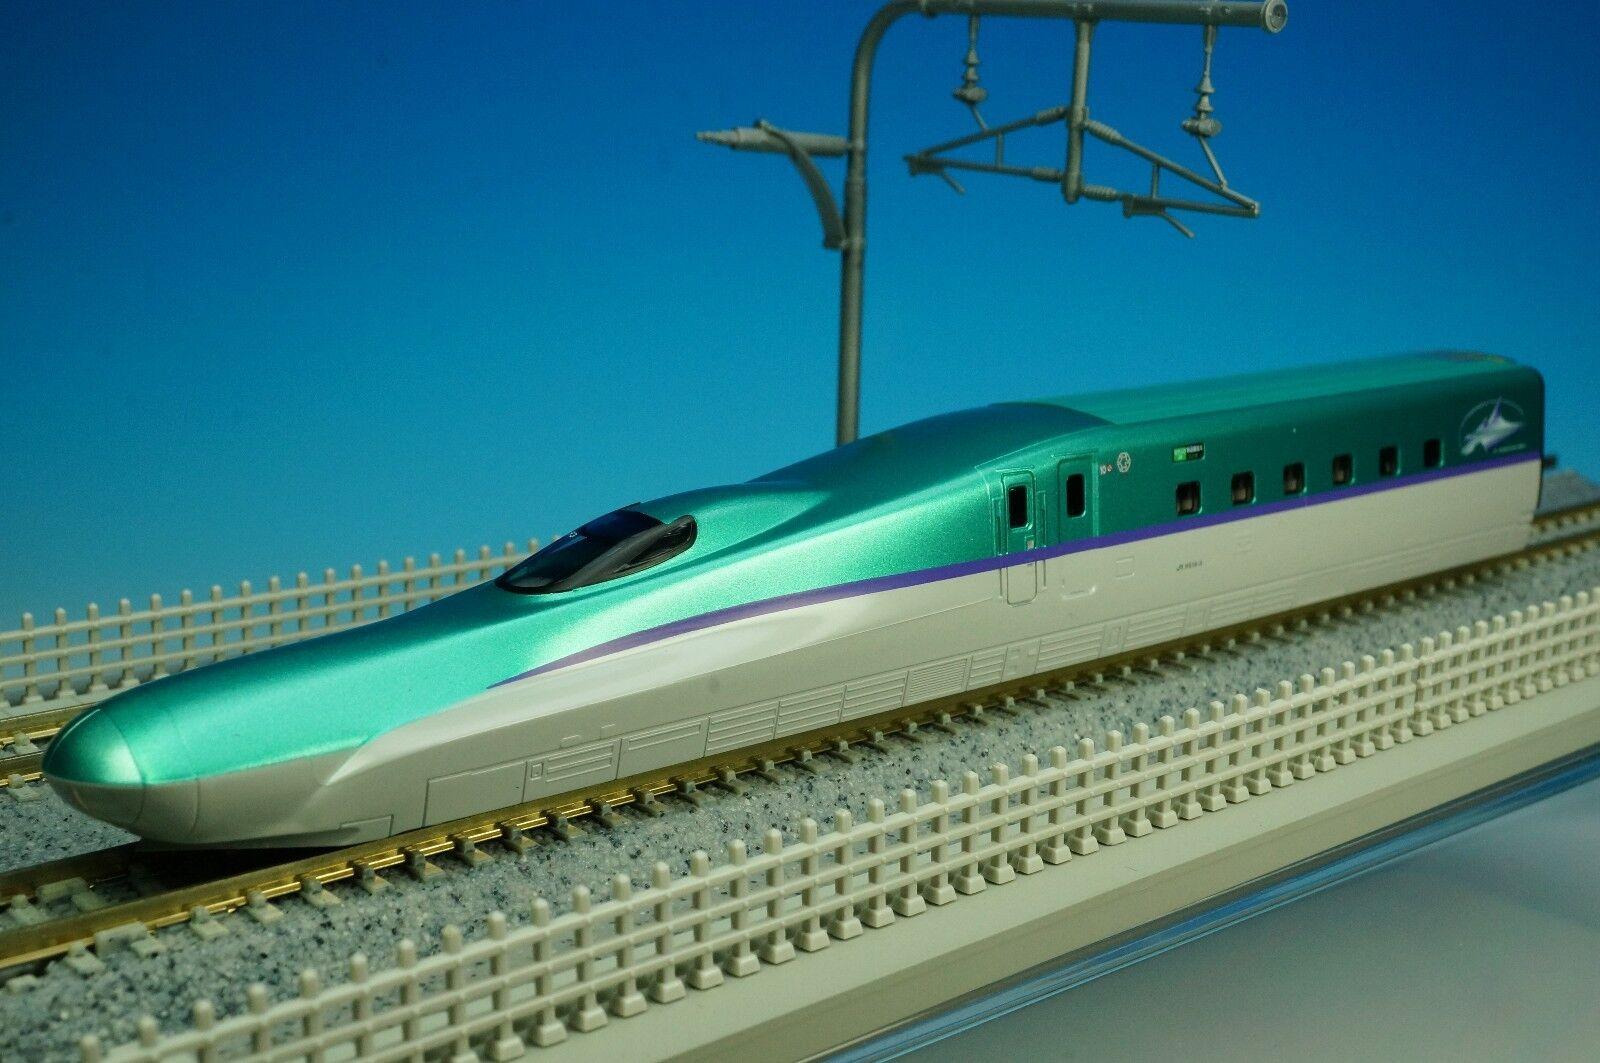 KATO 4837-A JR SHINKANSEN Bullet Train H5 Hokkaido Hayabusa H514-3 H514-3 H514-3 No.10 Car New 5d29f1